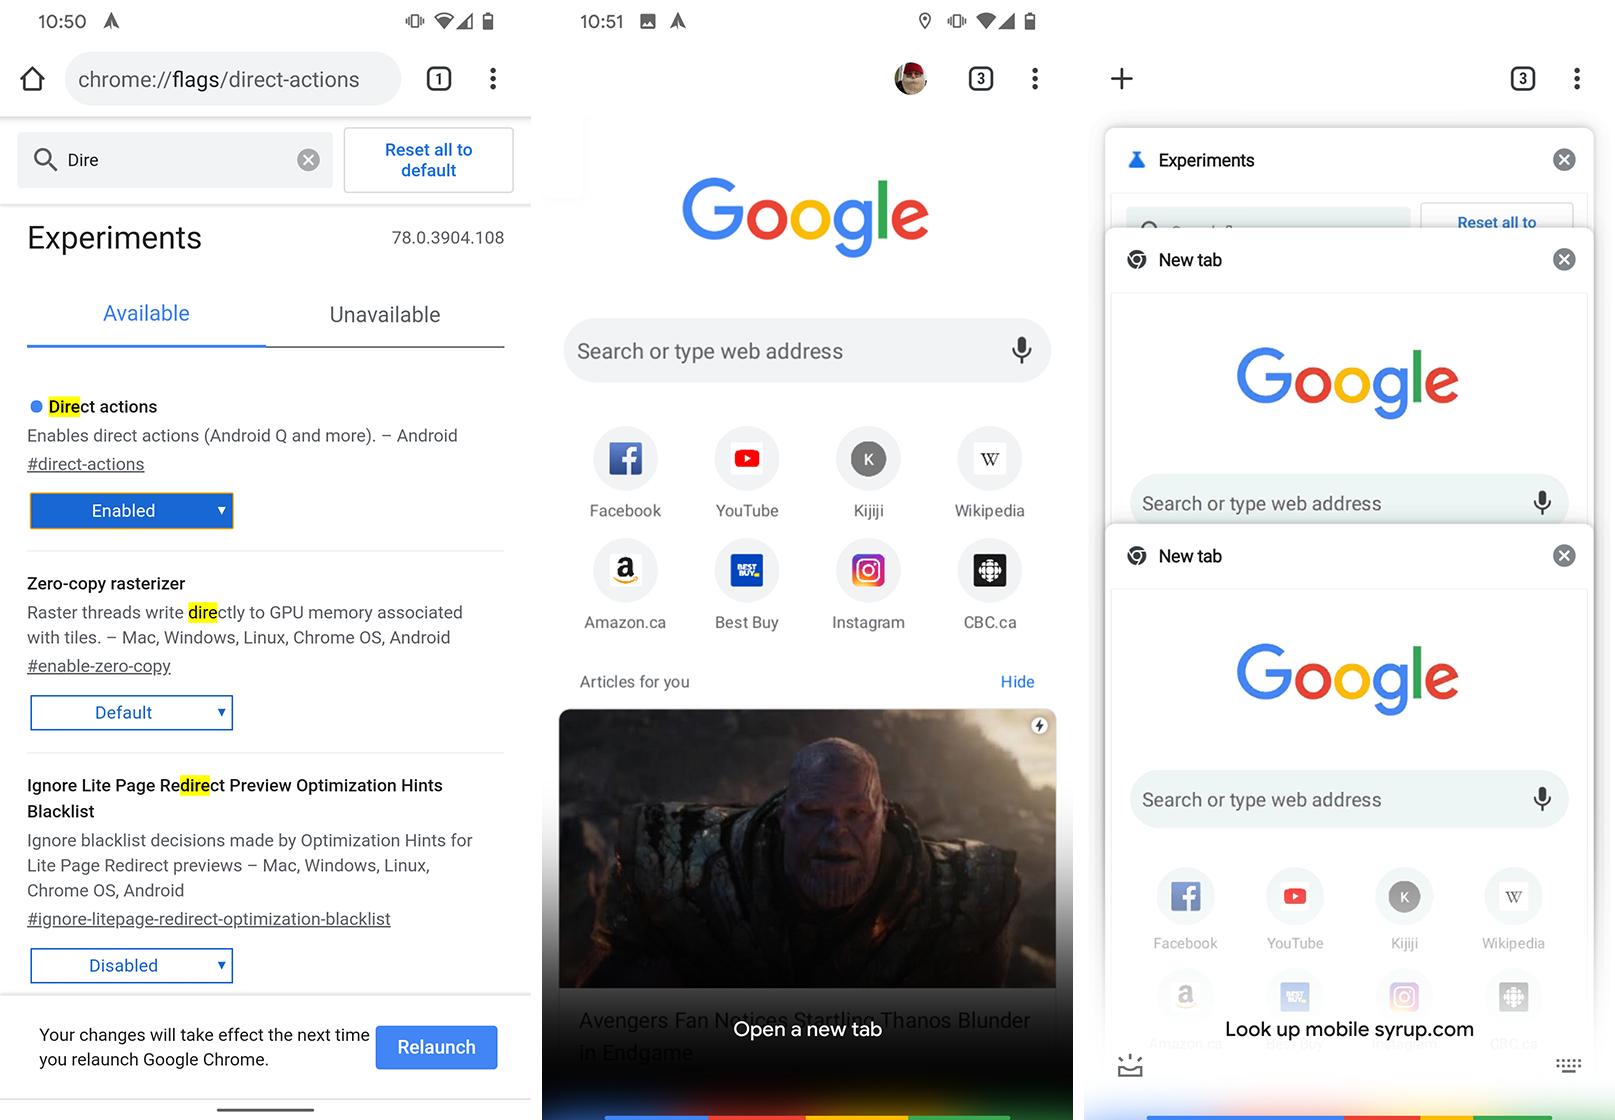 Google Assistant Chrome integration